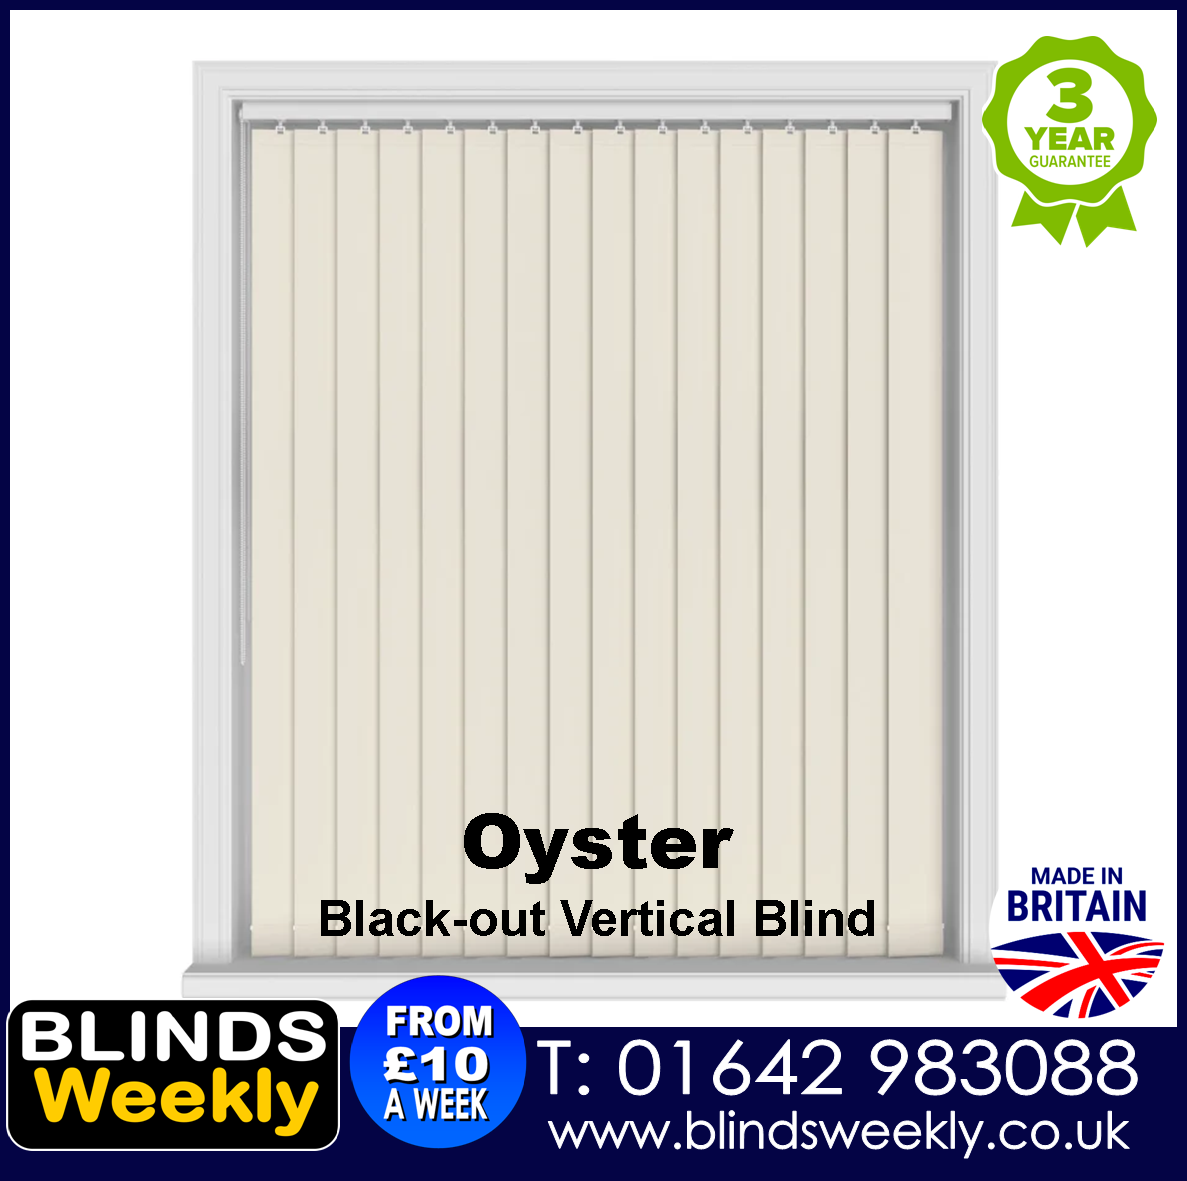 Blinds Weekly Blackout Vertical Blind - Oyster